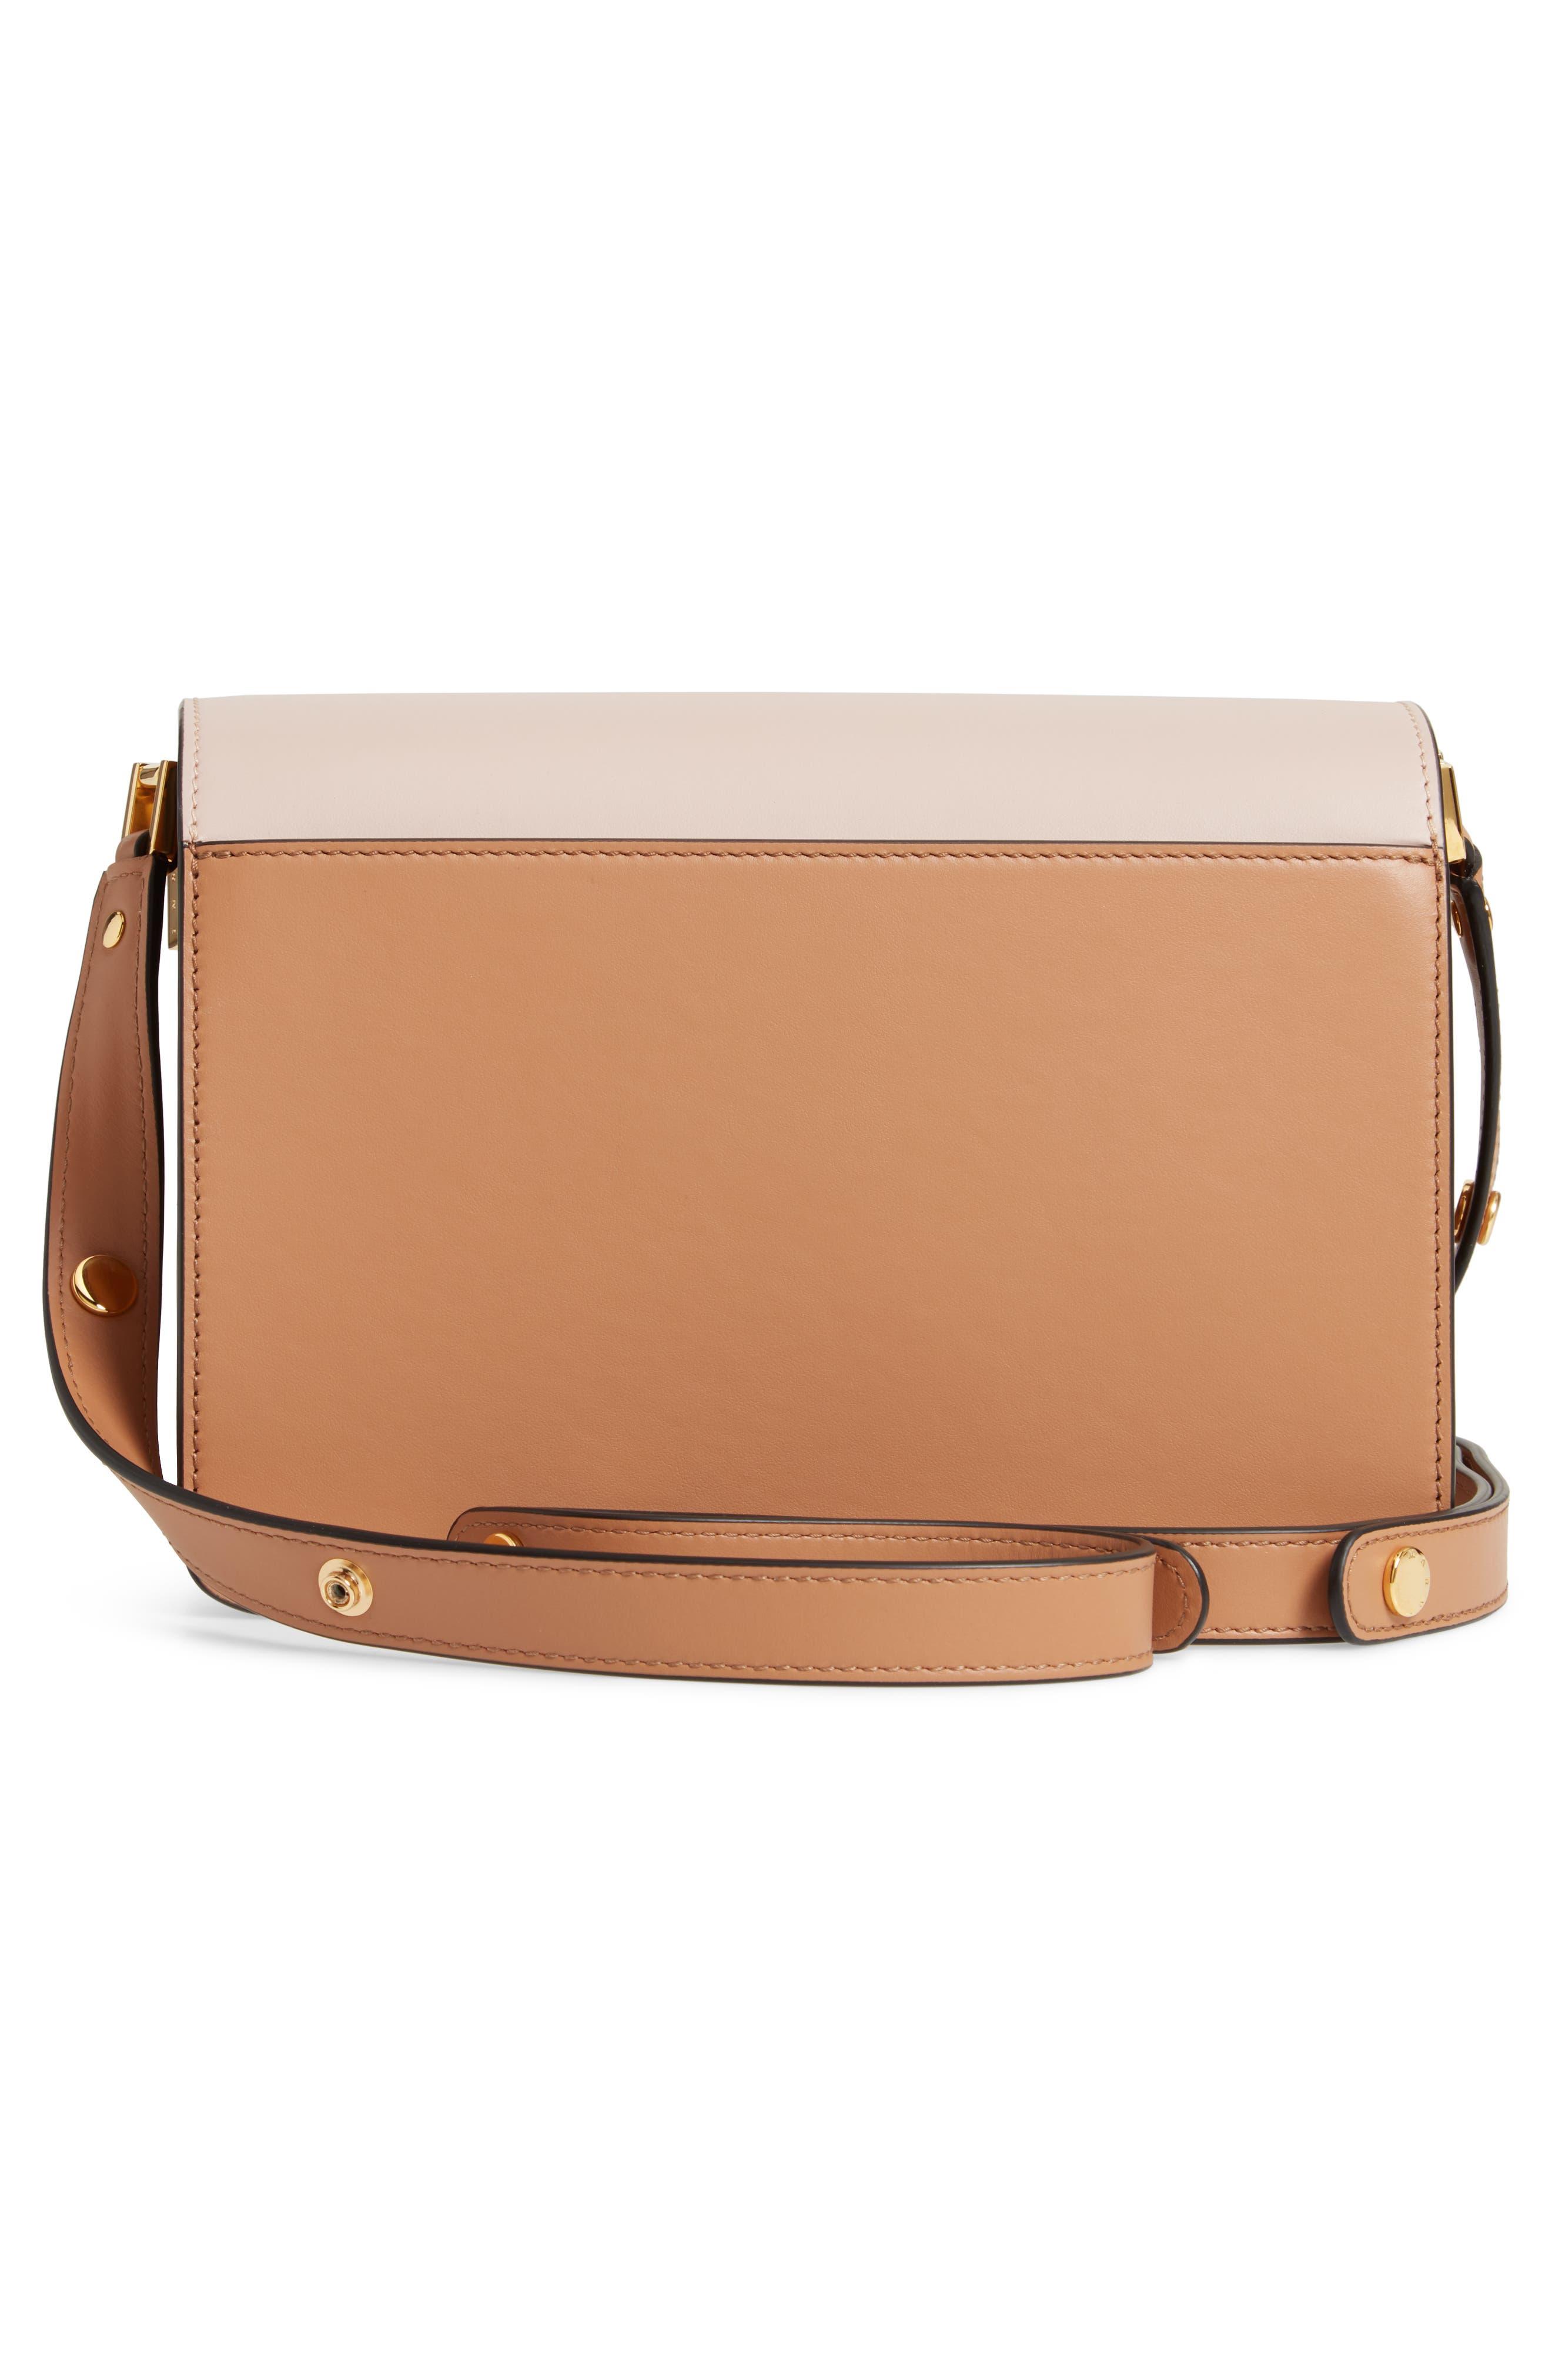 MARNI,                             Trunk Colorblock Leather Shoulder Bag,                             Alternate thumbnail 3, color,                             QUARTZ/ SUNO/ POMPEII